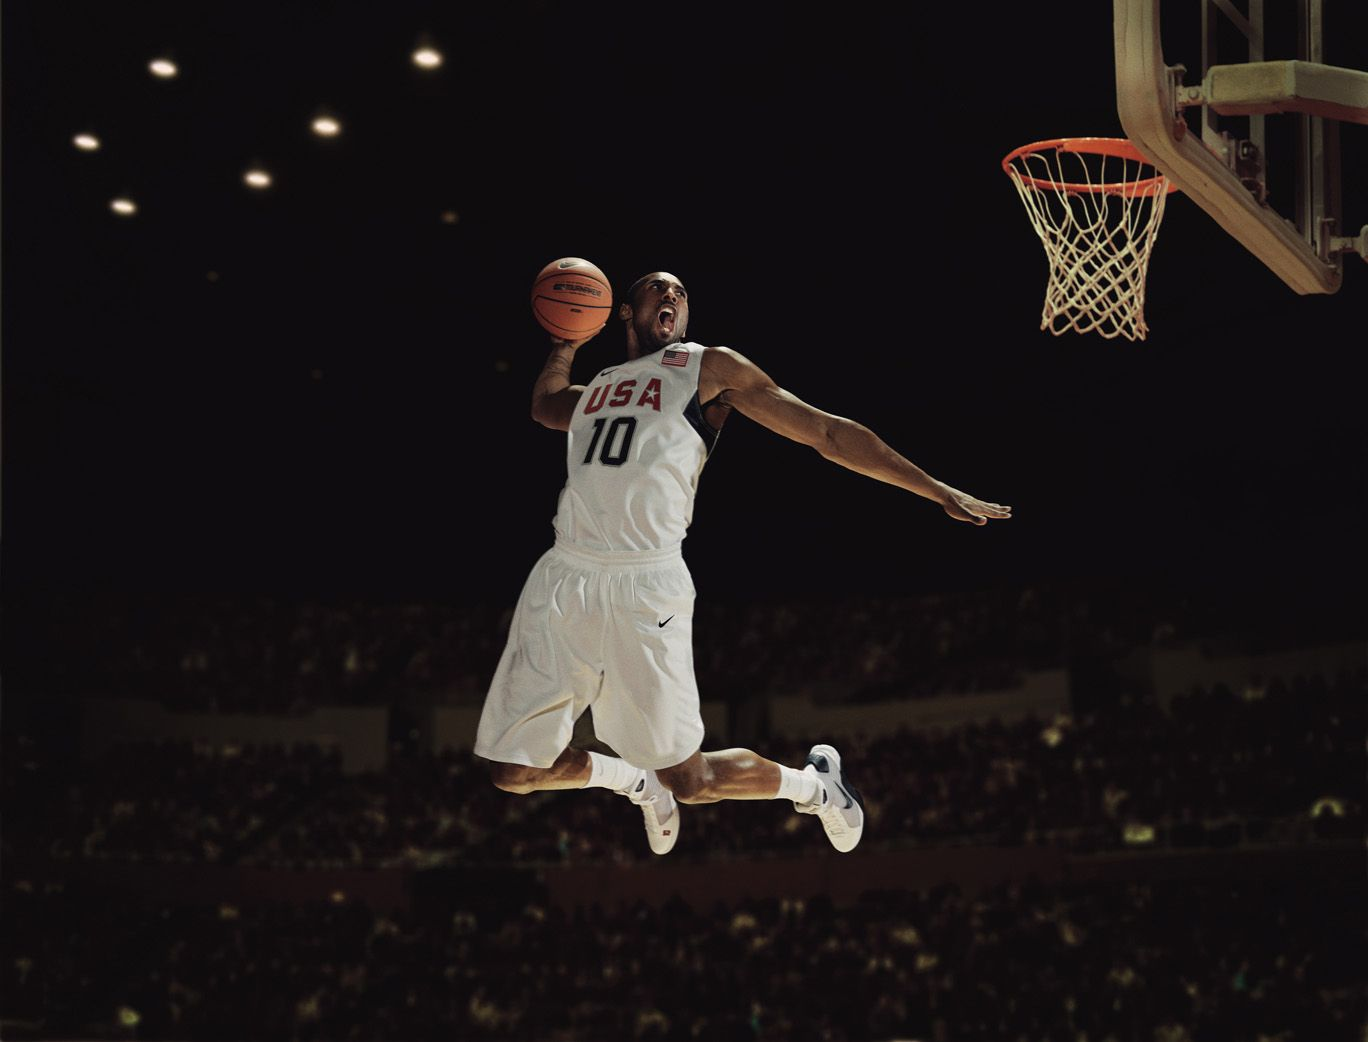 45 Kobe Bryant Wallpapers Hd Download Kobe Bryant Wallpaper Kobe Bryant Pictures Kobe Bryant